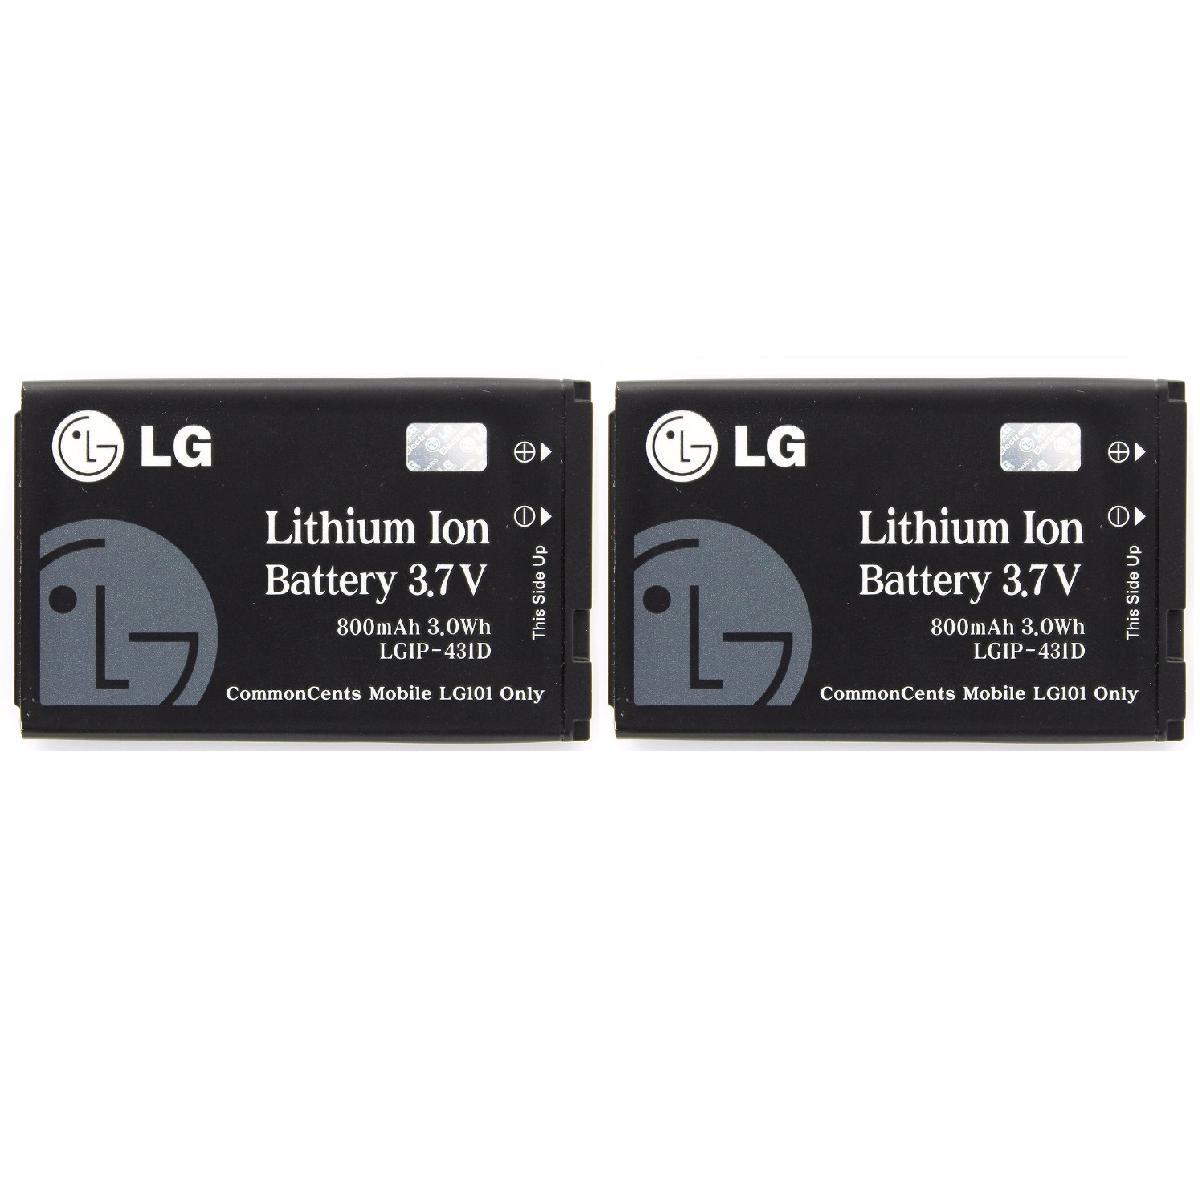 KIT 2x LG LGIP-431D 800 mAh Replacement Battery for LG 101 102